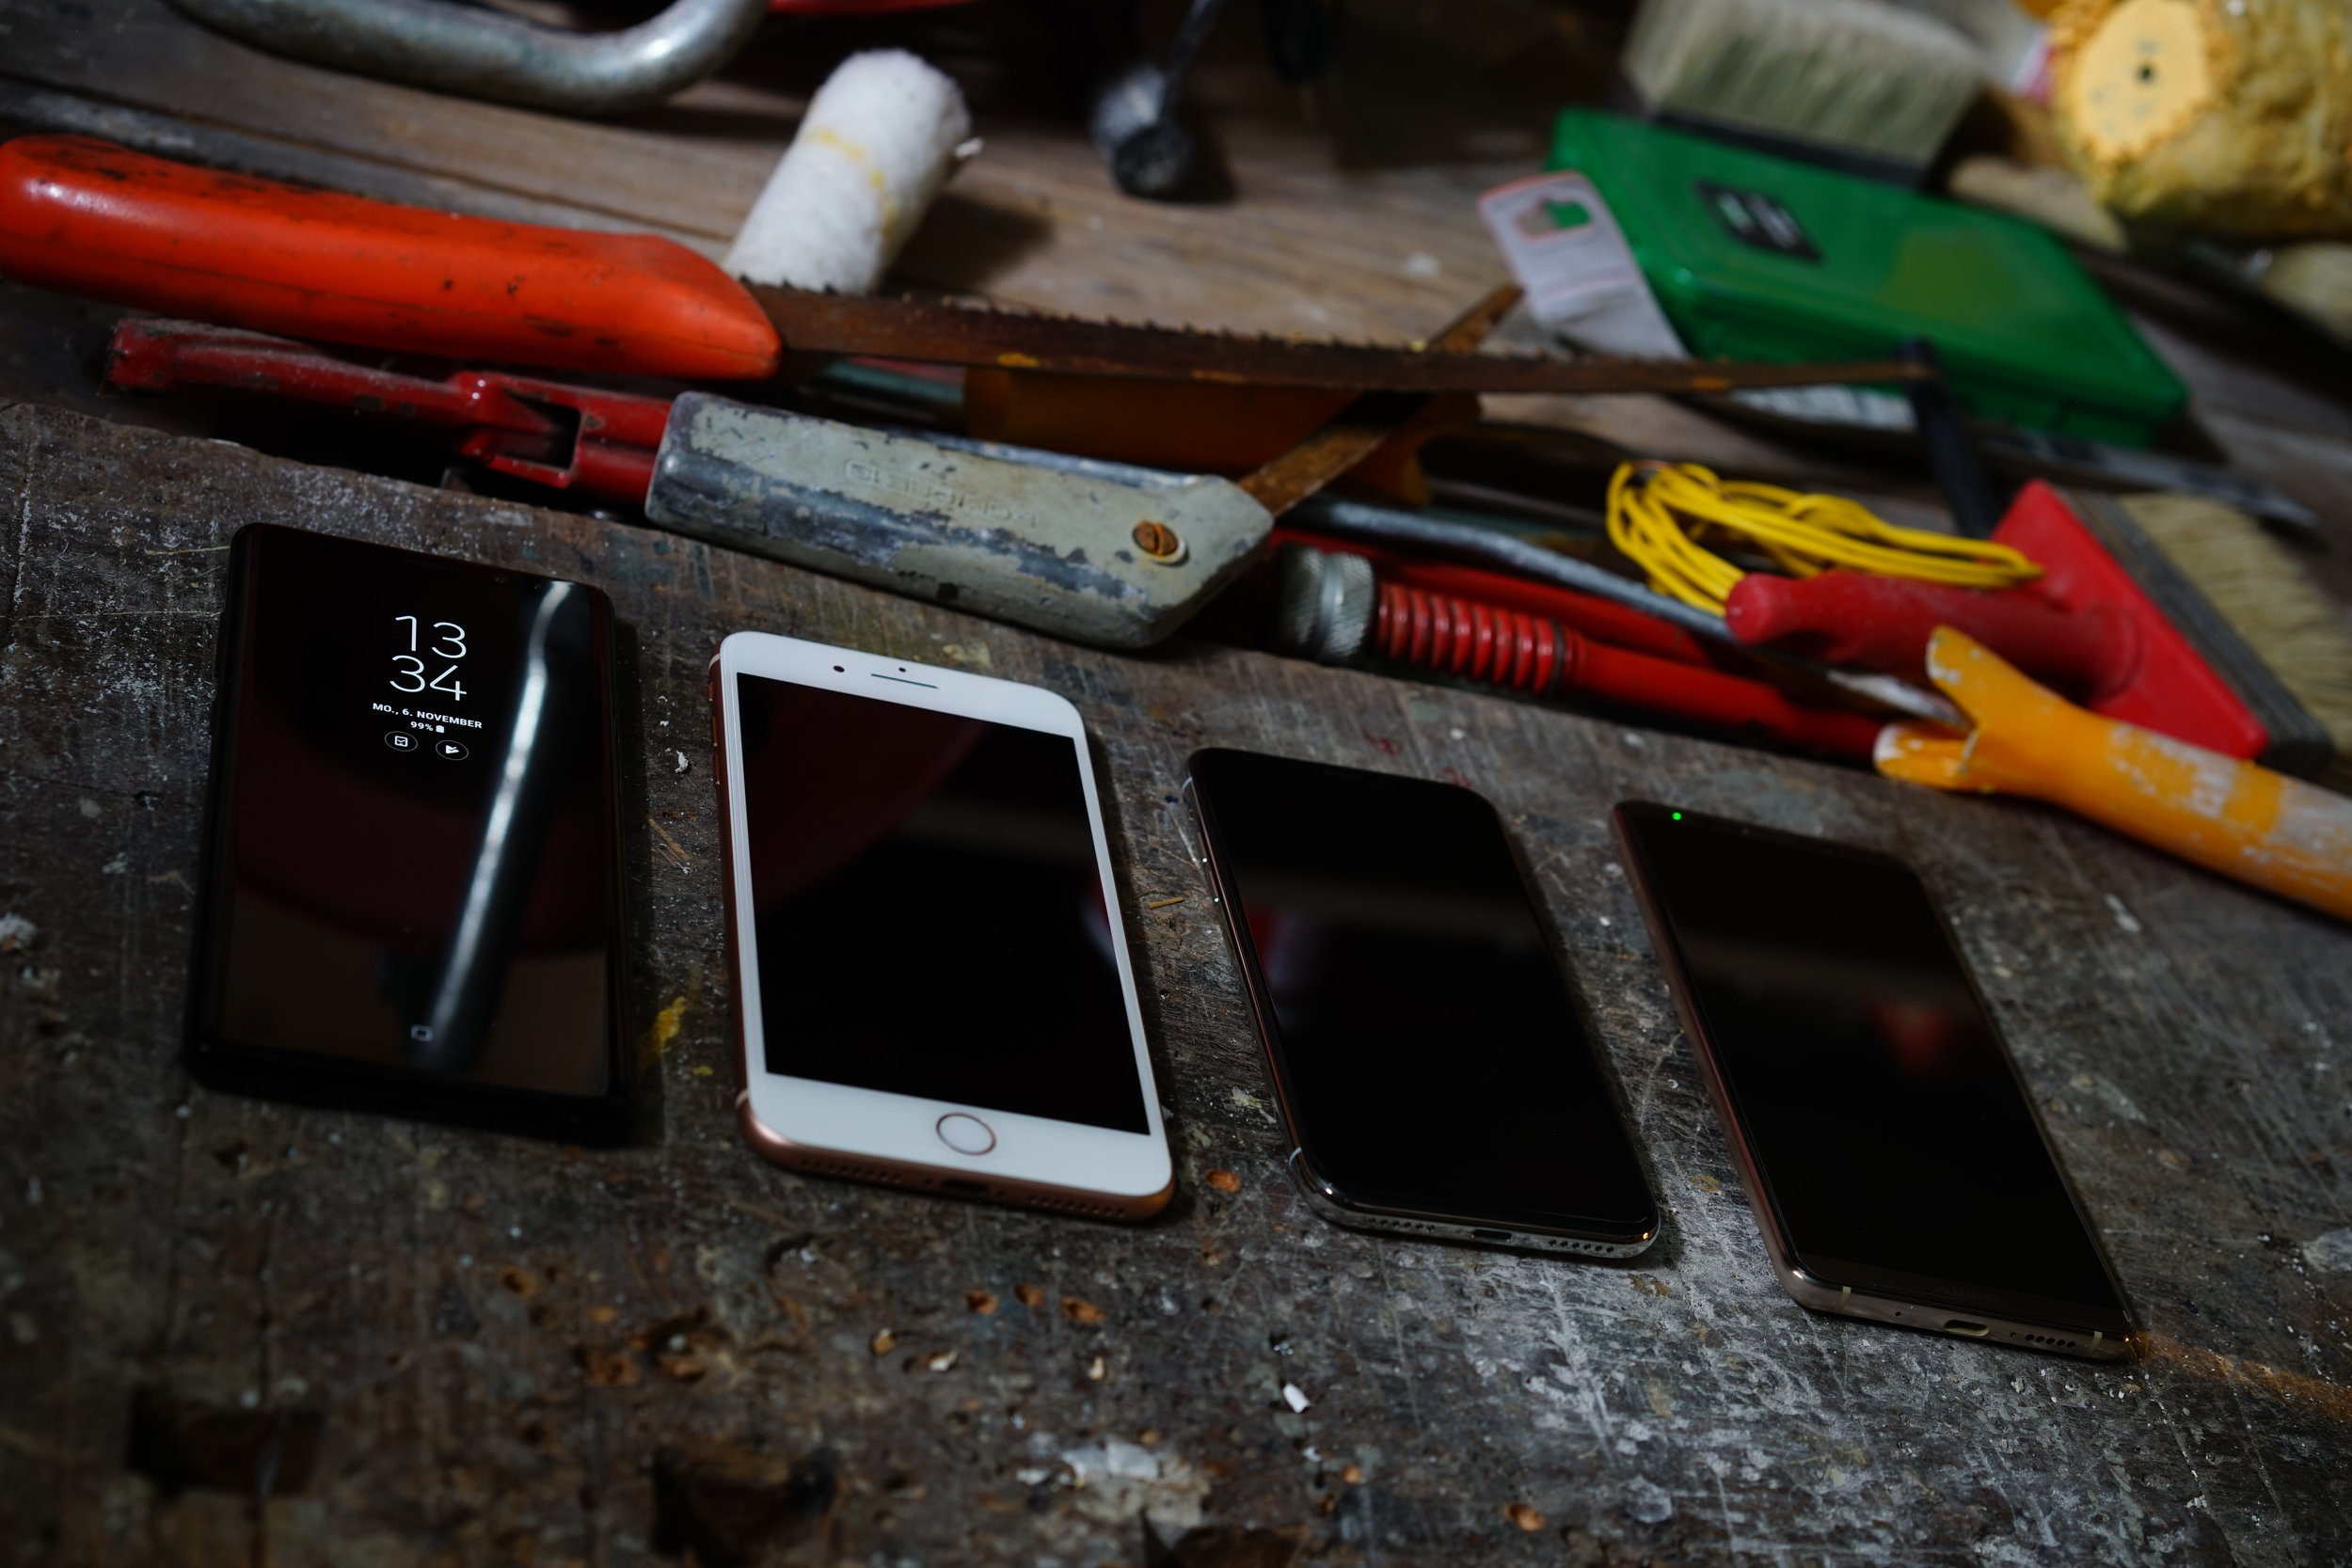 Note 8 vs iPhone 8 Plus vs iPhone x vs Mate 10